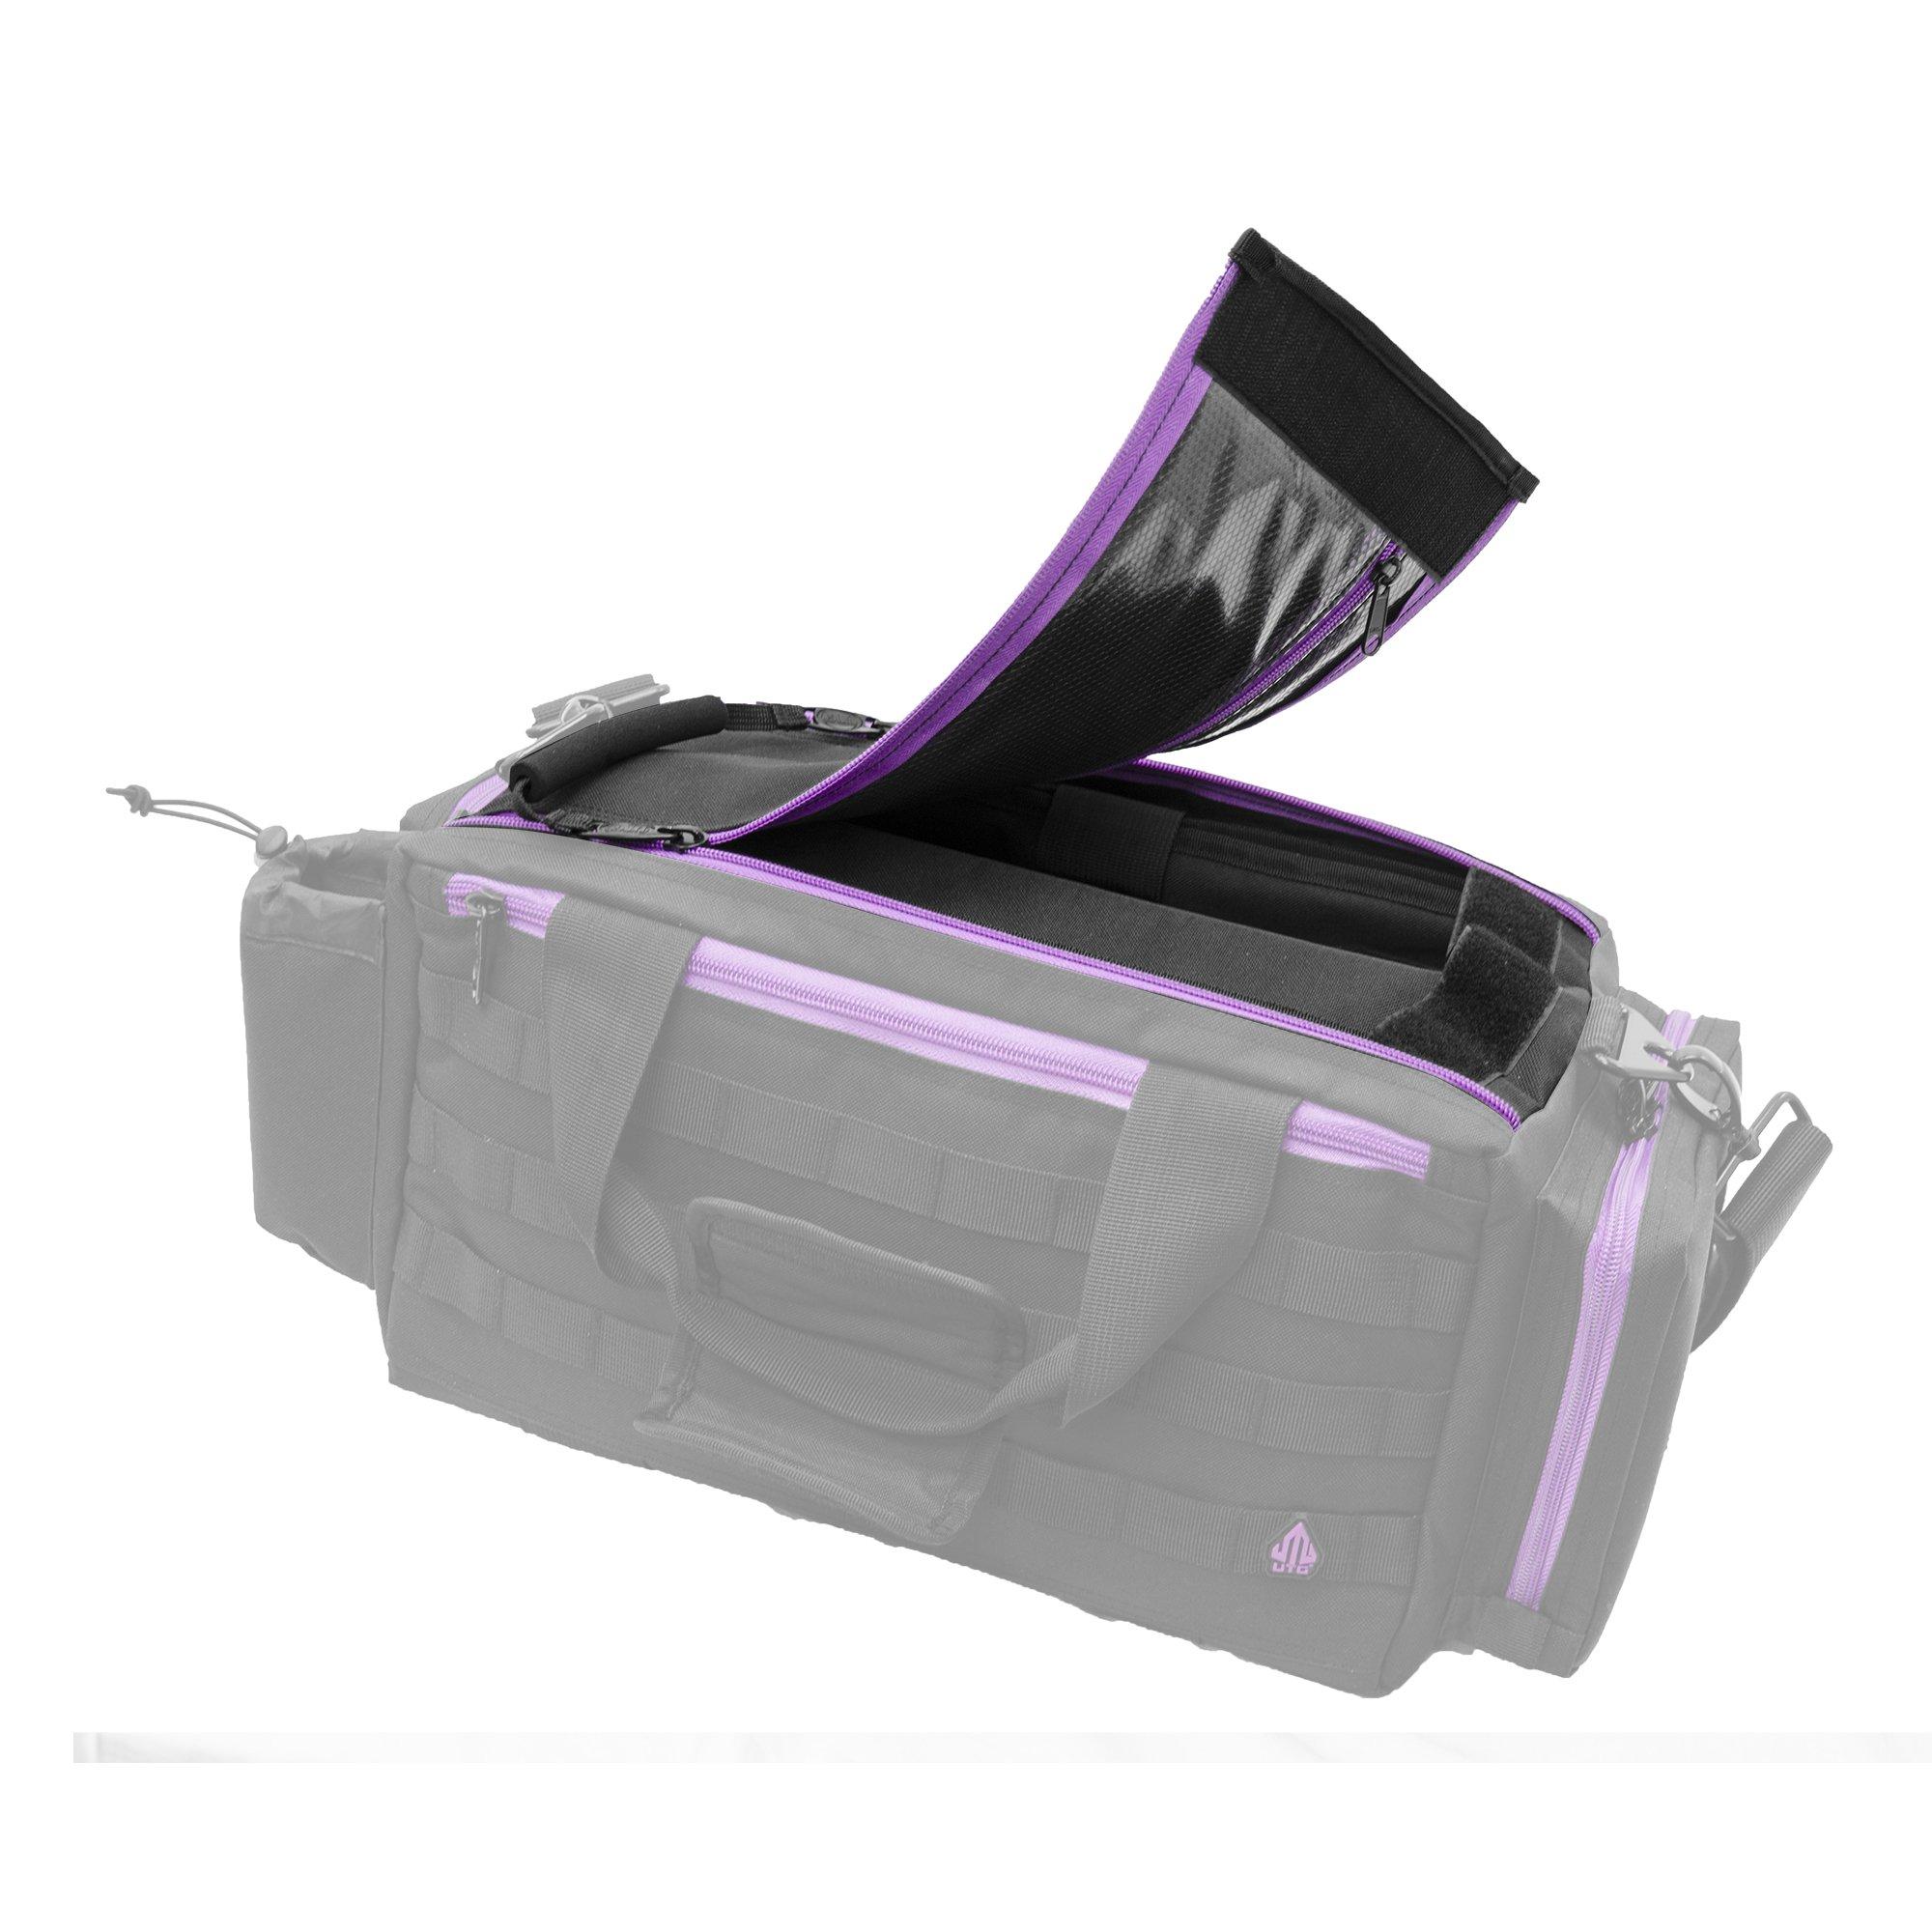 UTG All in One Range/Utility Go Bag, Black/Violet, 21'' x 10'' x 9'' by UTG (Image #6)